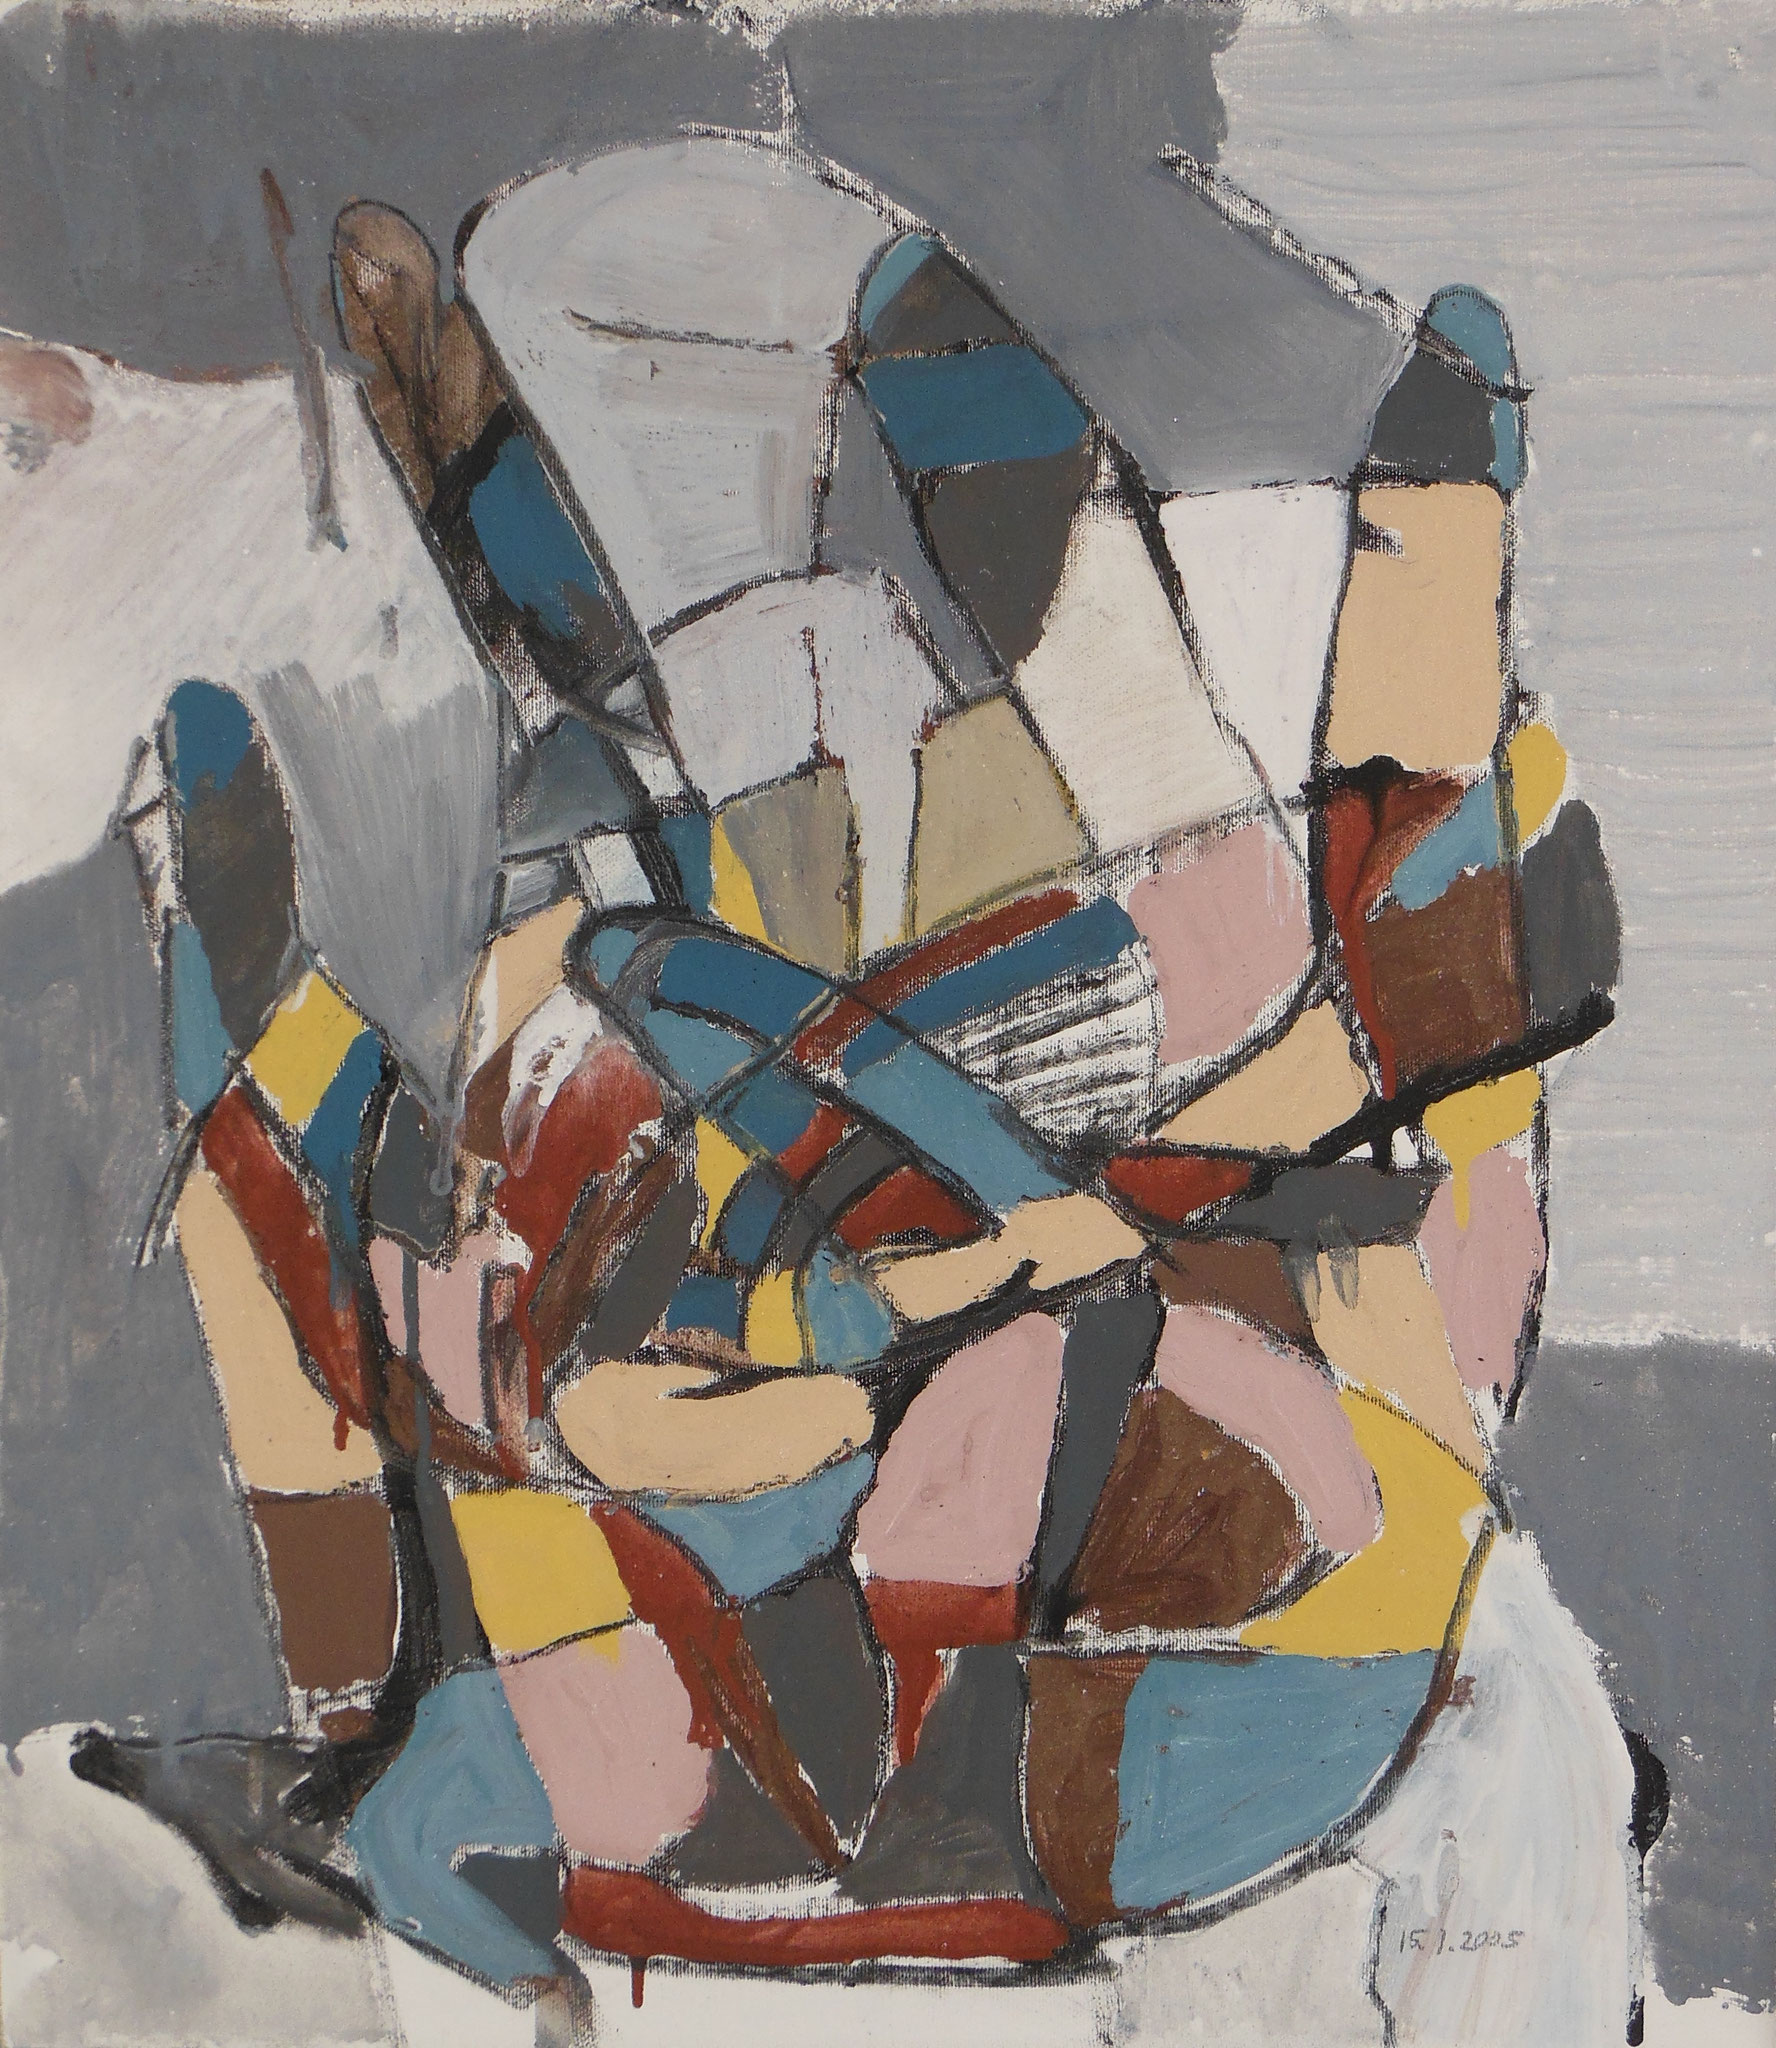 Handarbeit IV, 2005, 40x50, Leinwand